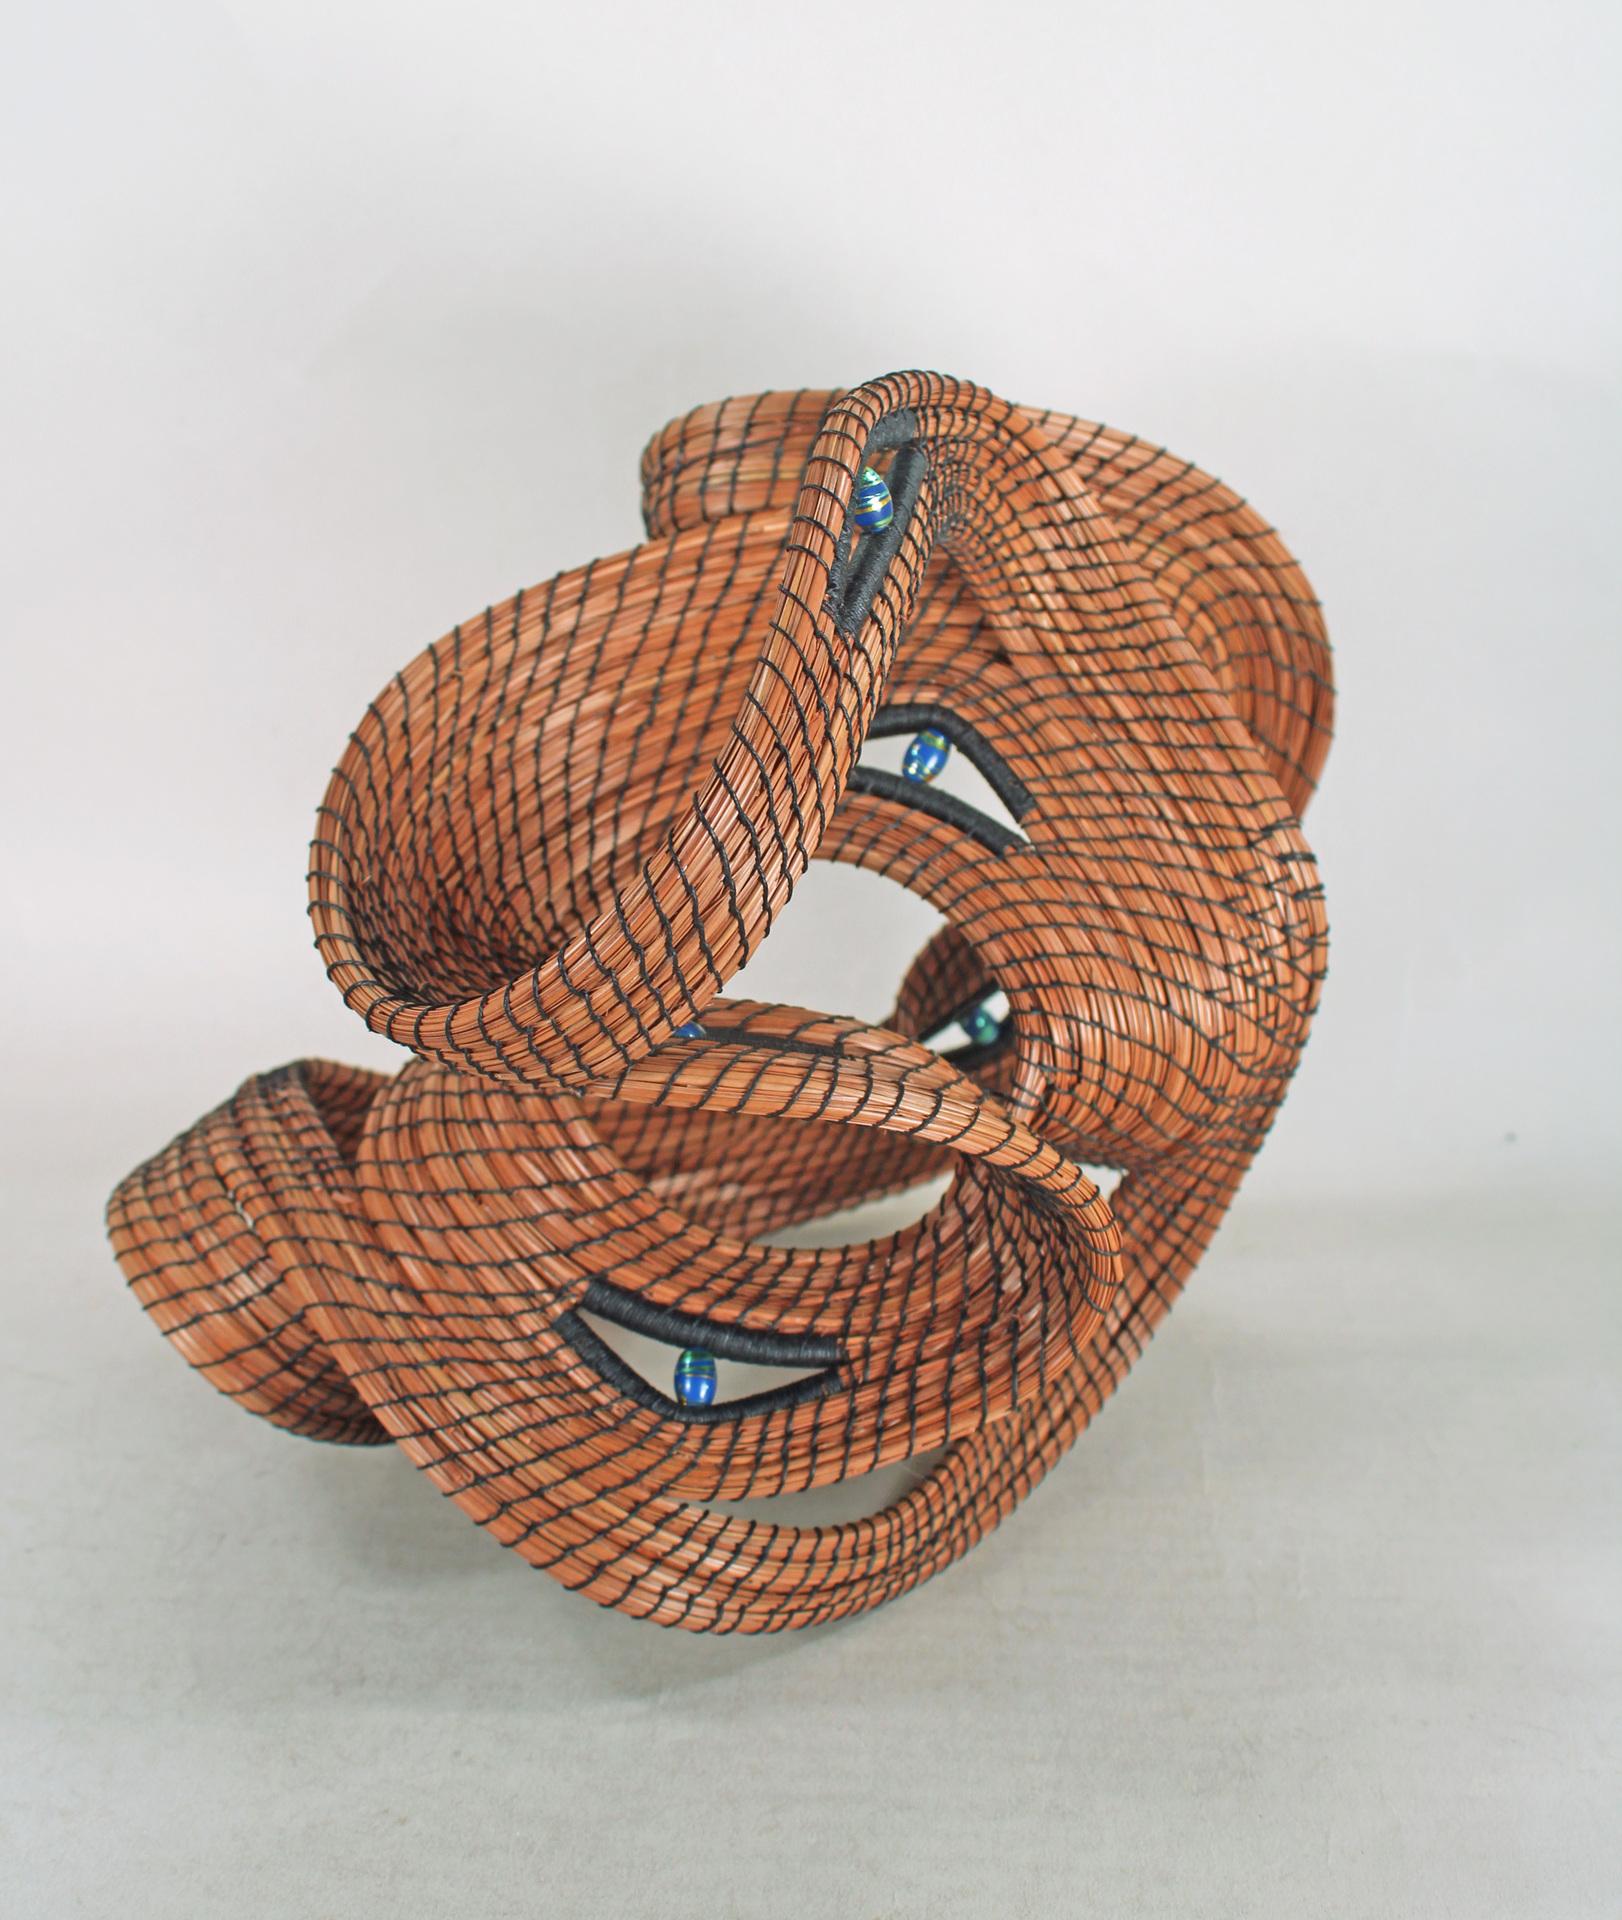 PEGGY WYMAN  - Macomb, MO   Starshine   fiber (pine needle), $495